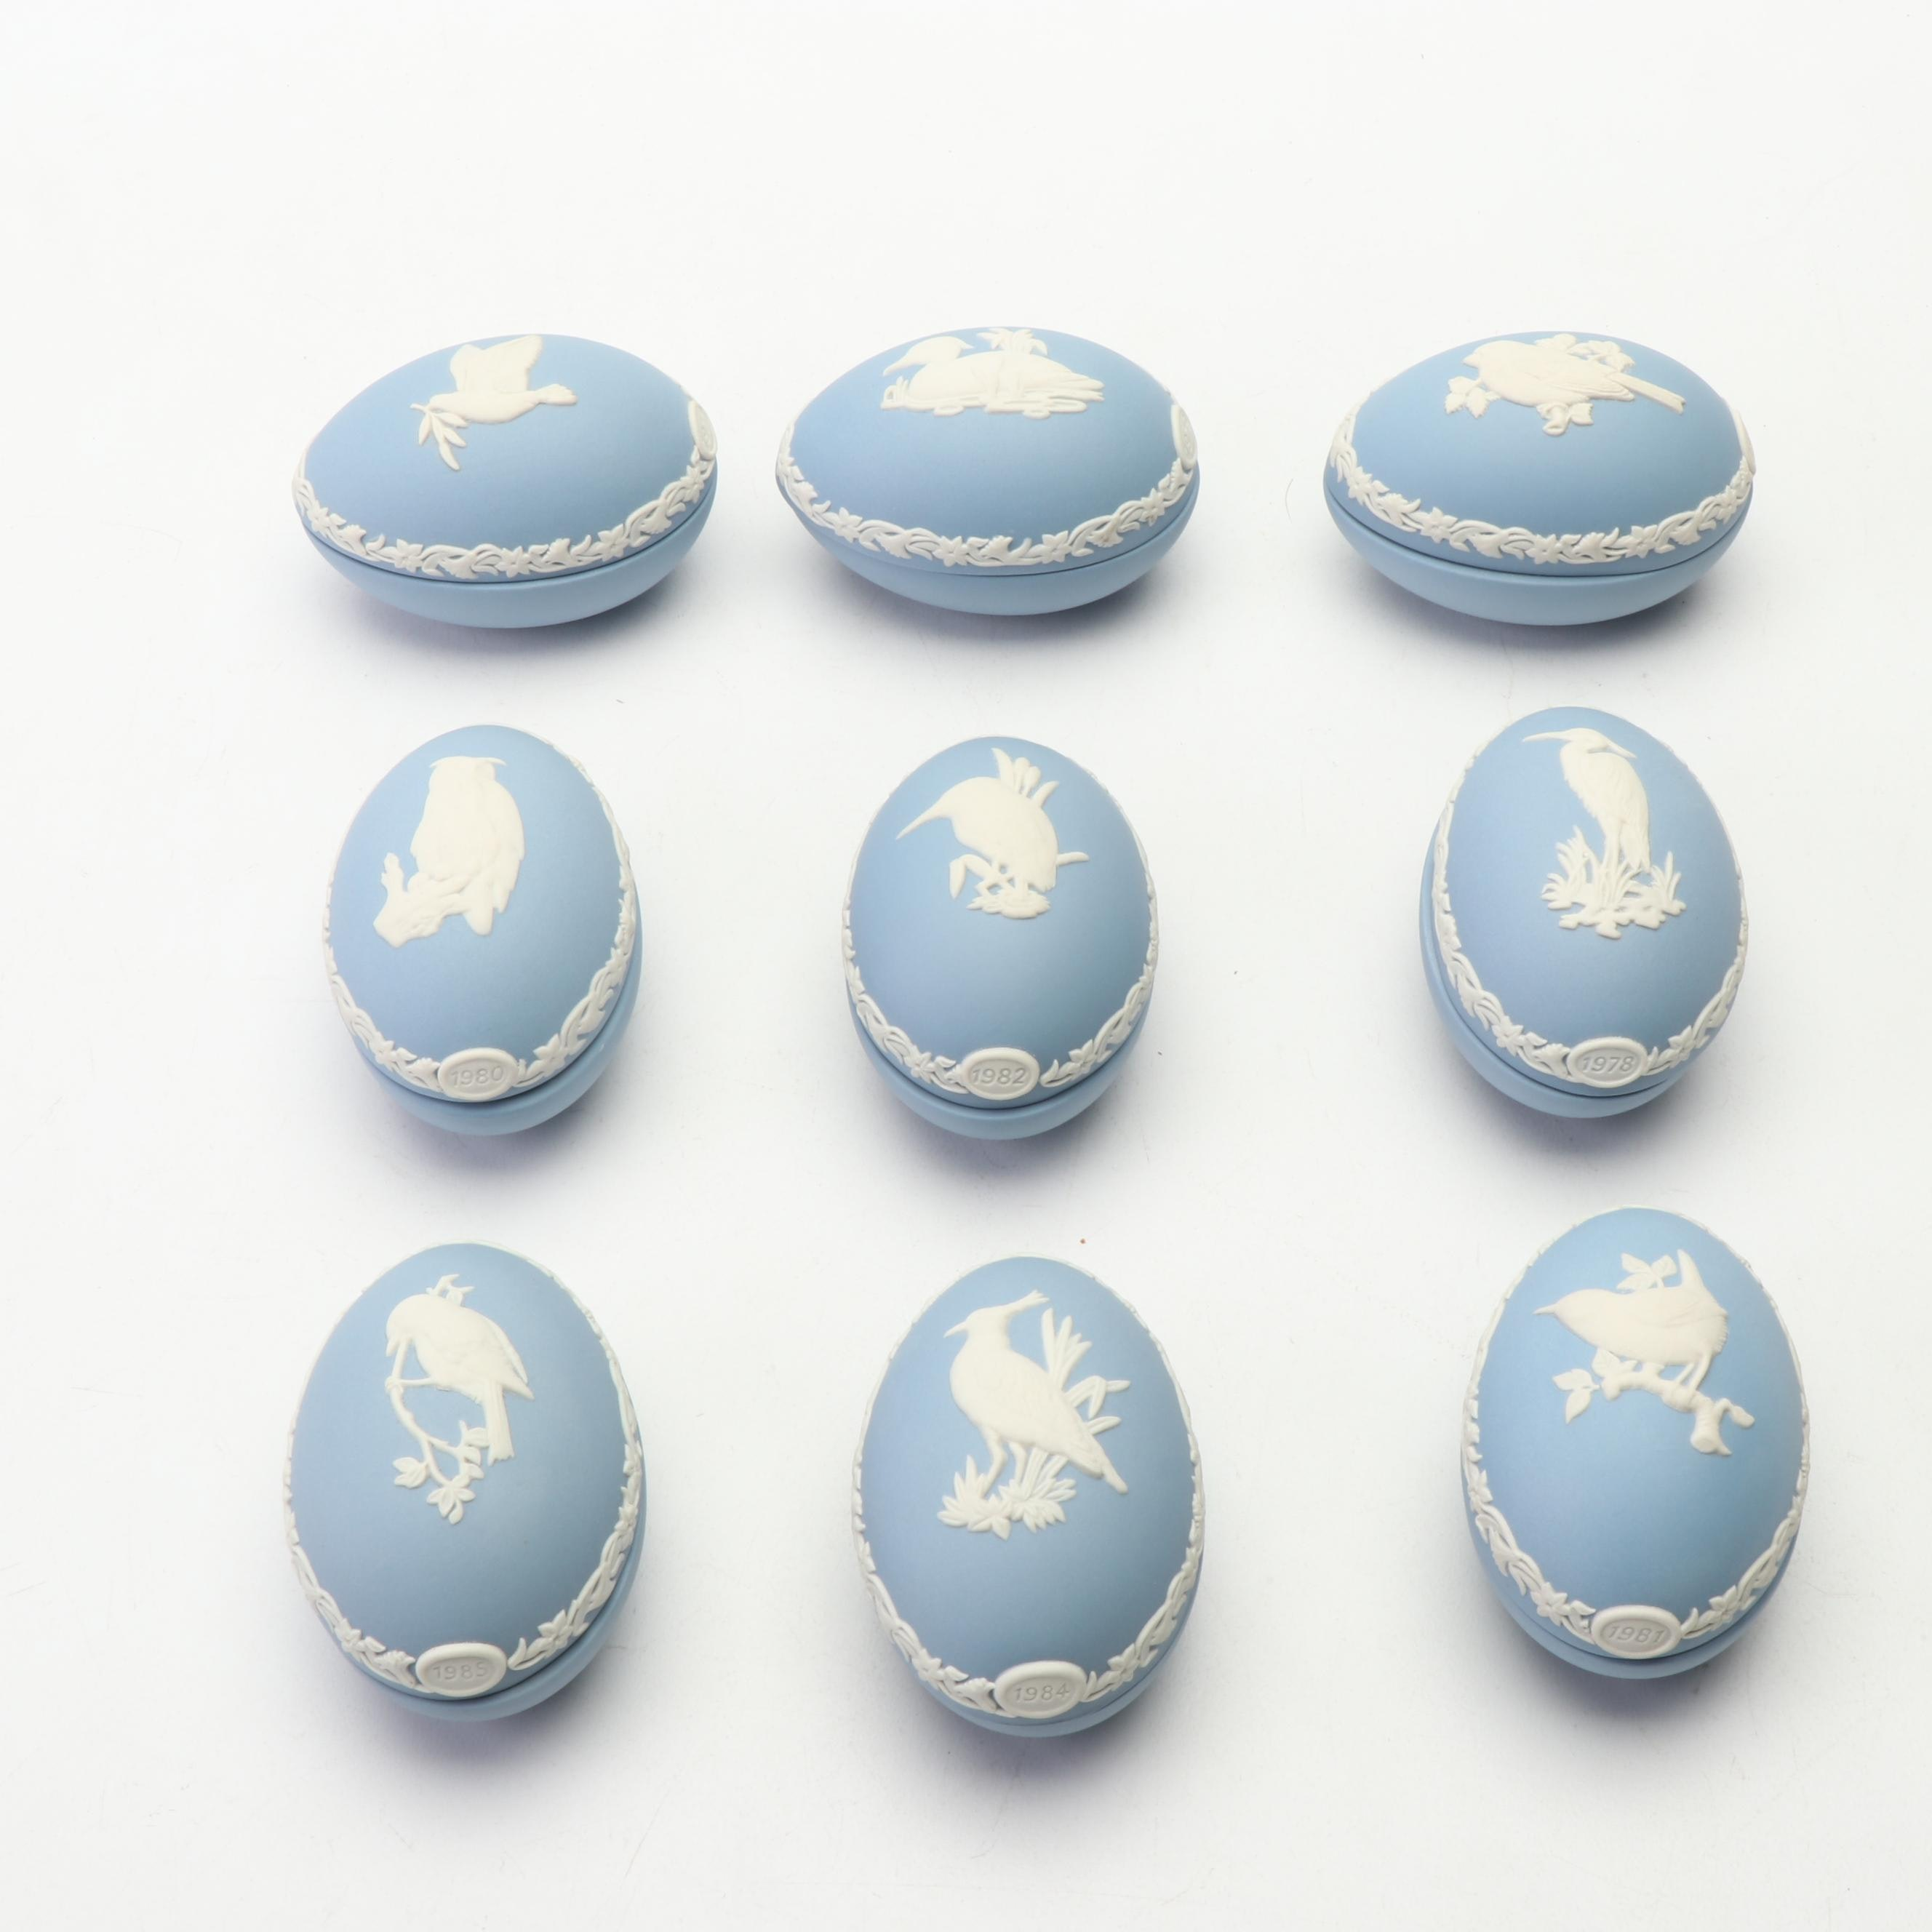 Wedgwood Blue Jasperware Bird Motif Trinket Boxes, 1977-1985